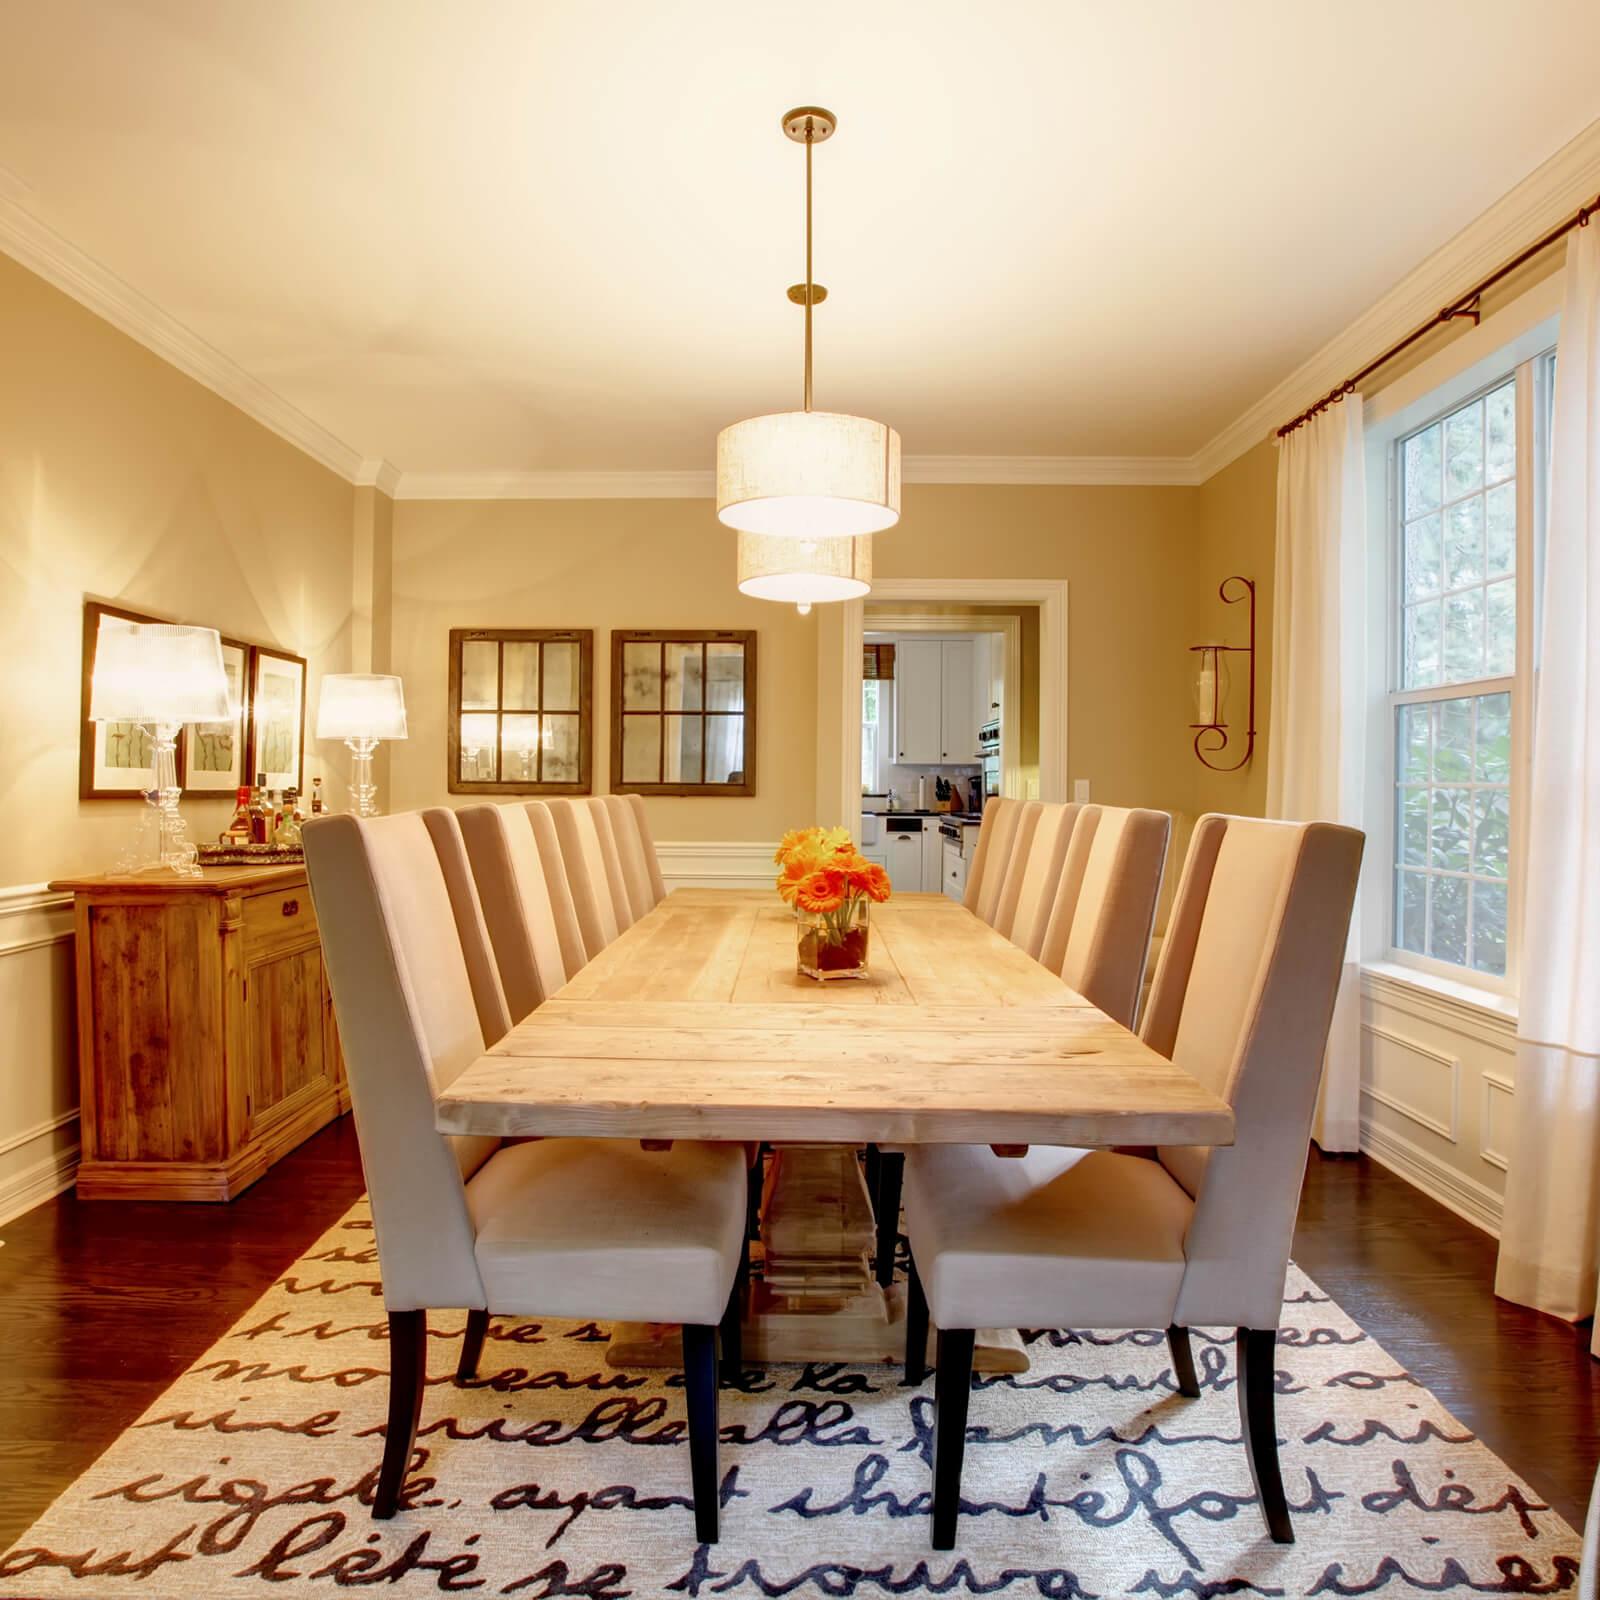 Choosing rug for dining room | Shan's Carpets & Fine Flooring